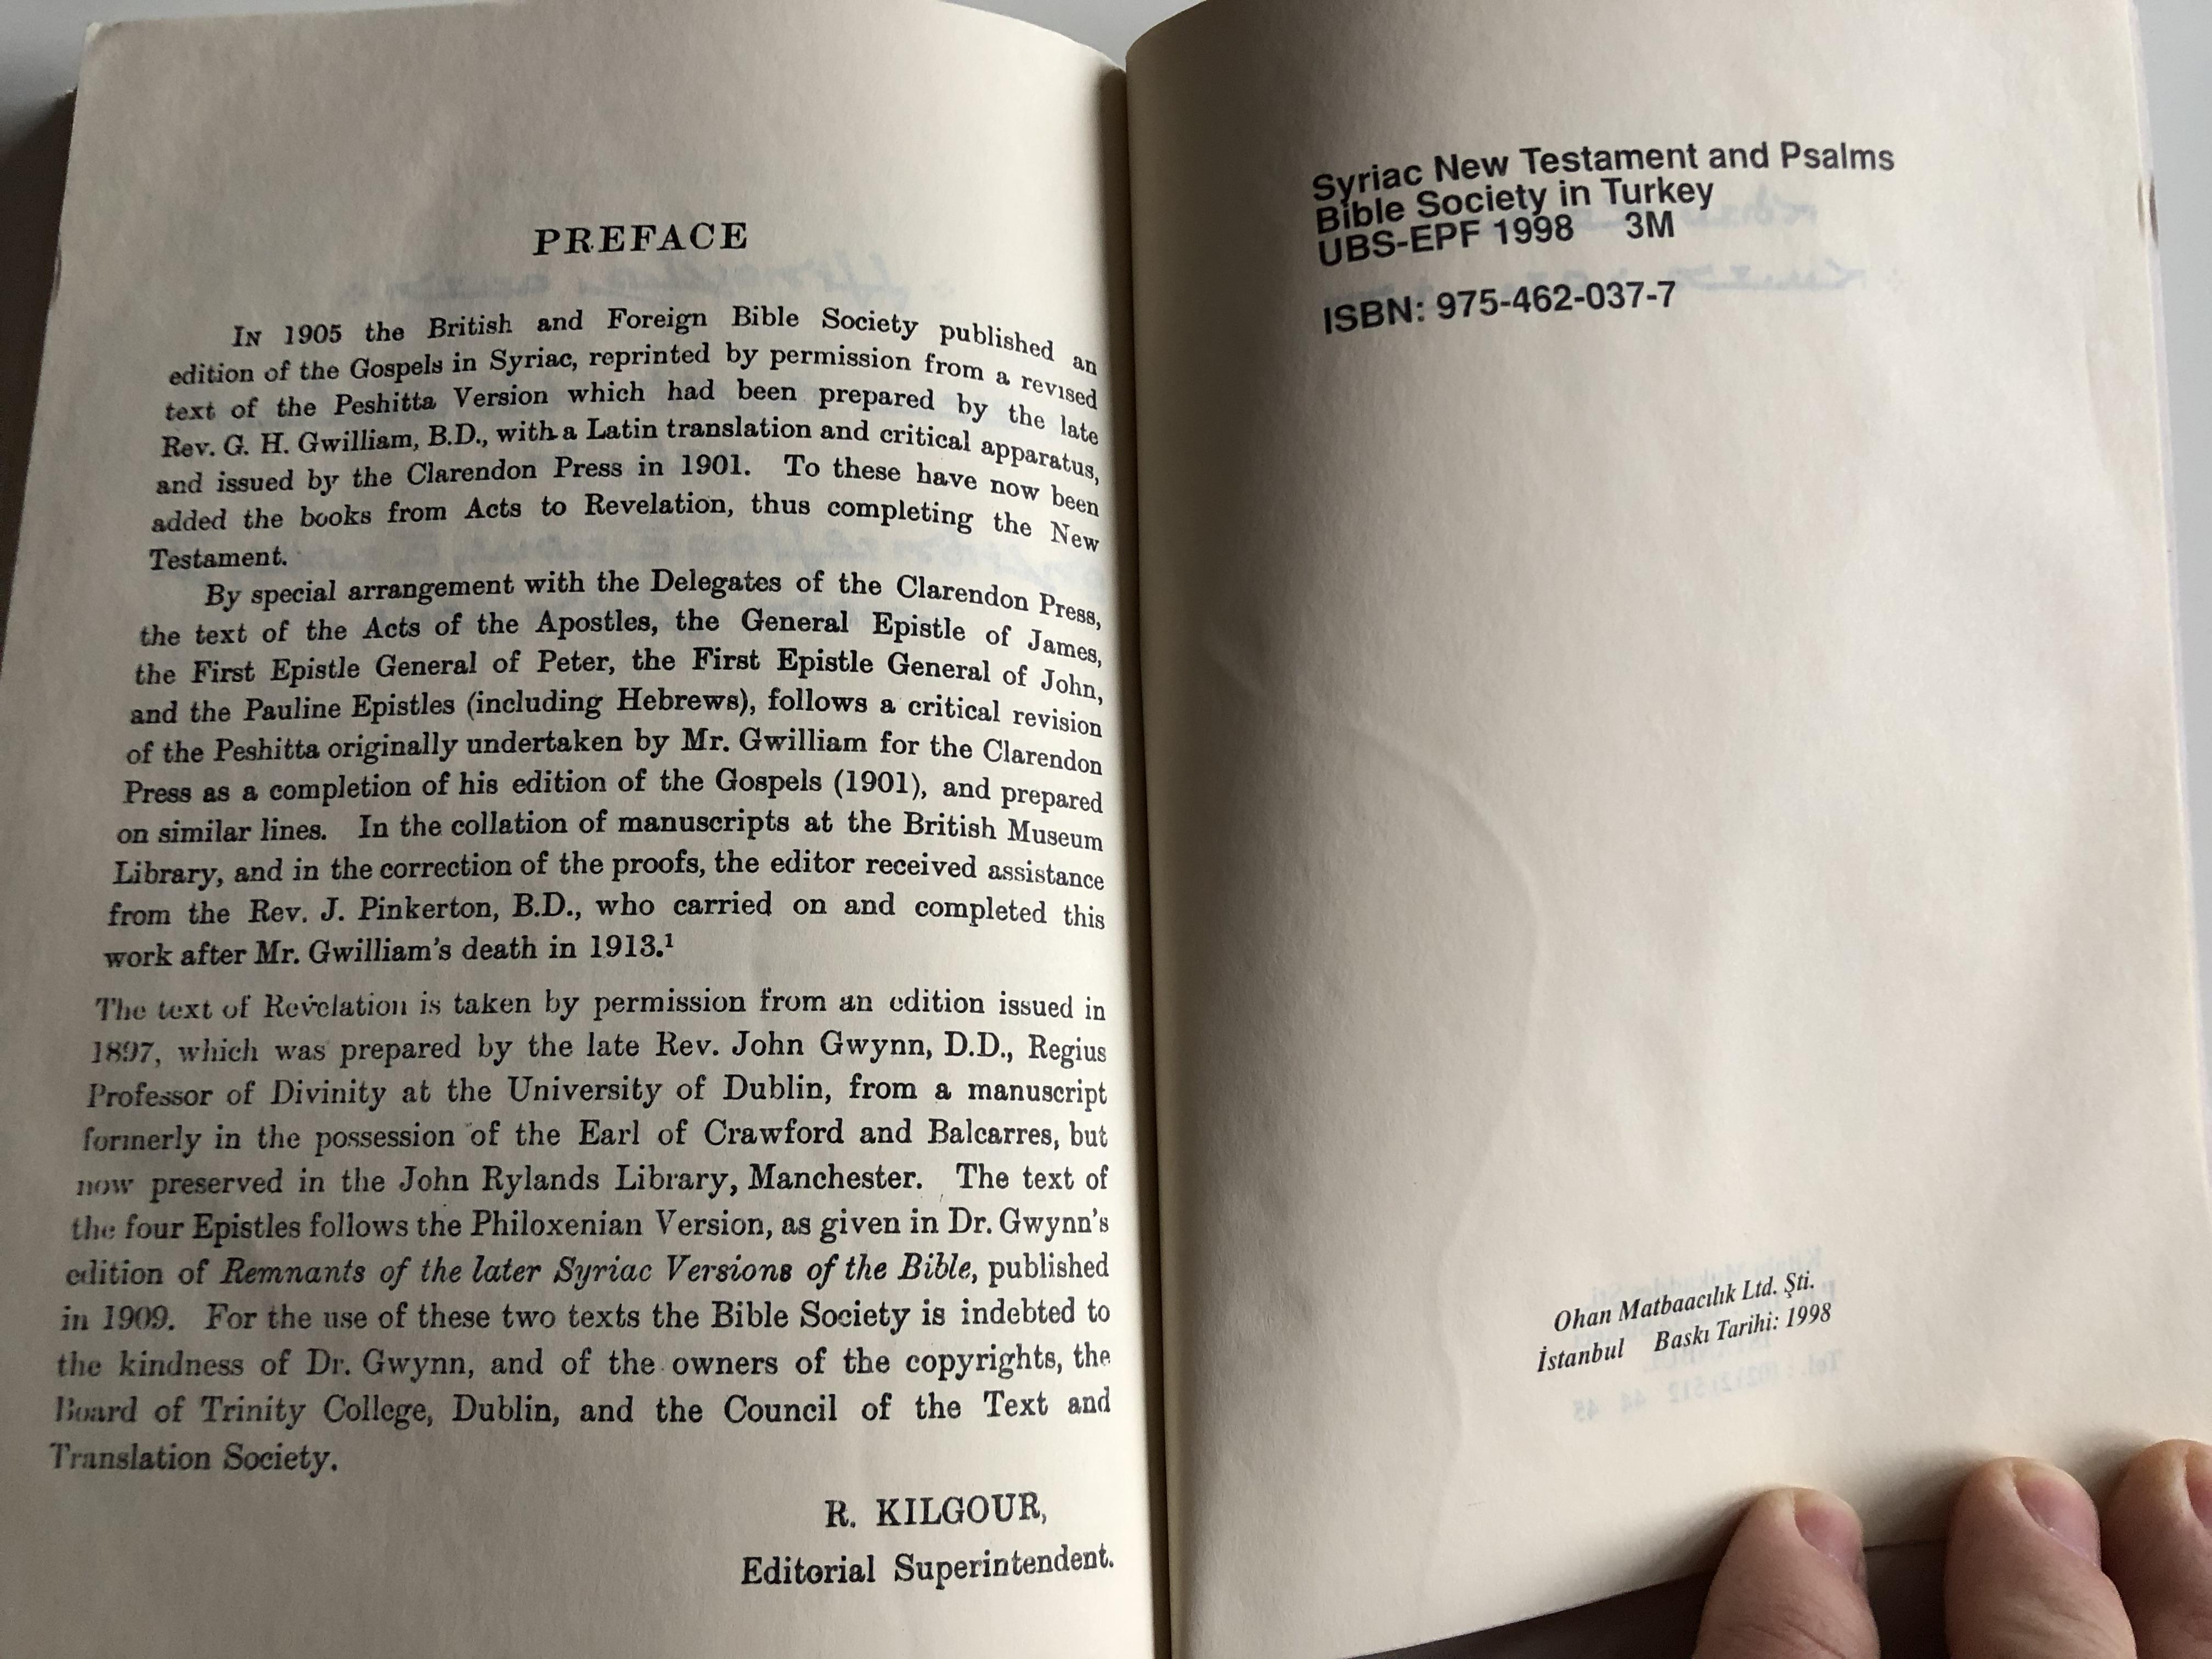 syriac-new-testament-and-psalms-ubs-epf-1998-pshitto-nt-3-.jpg